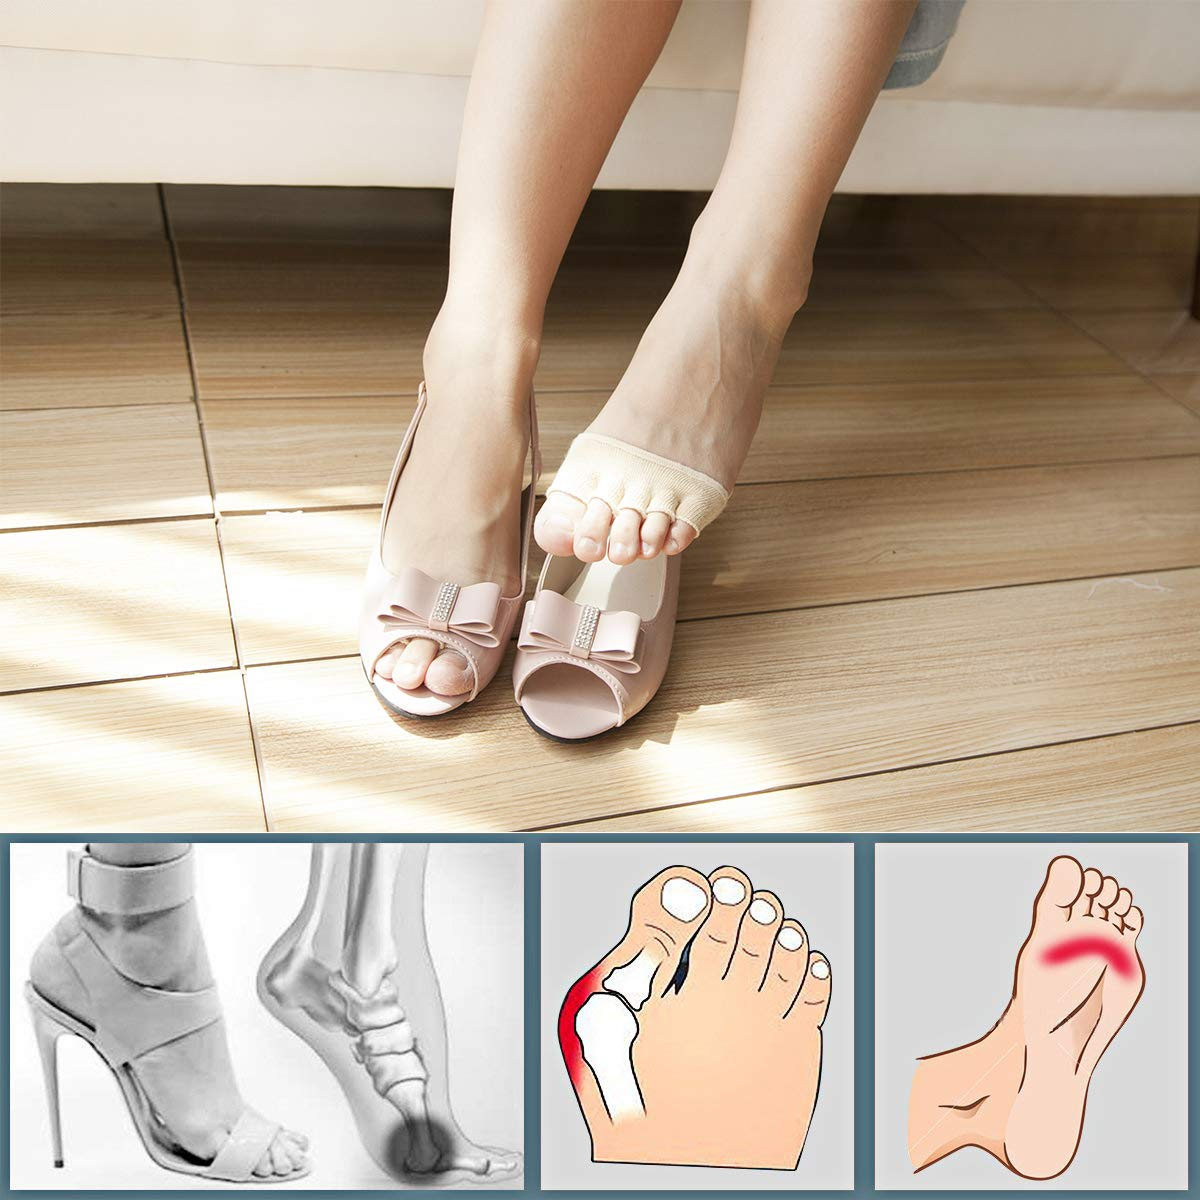 Toe Socks, Cotton Non-Slip Women's Toe Toppers Socks Toe Separating Socks No-Show Half Socks Barre Pilates Yoga Half Palm Socks(2 Pairs) by Pnrskter (Image #3)